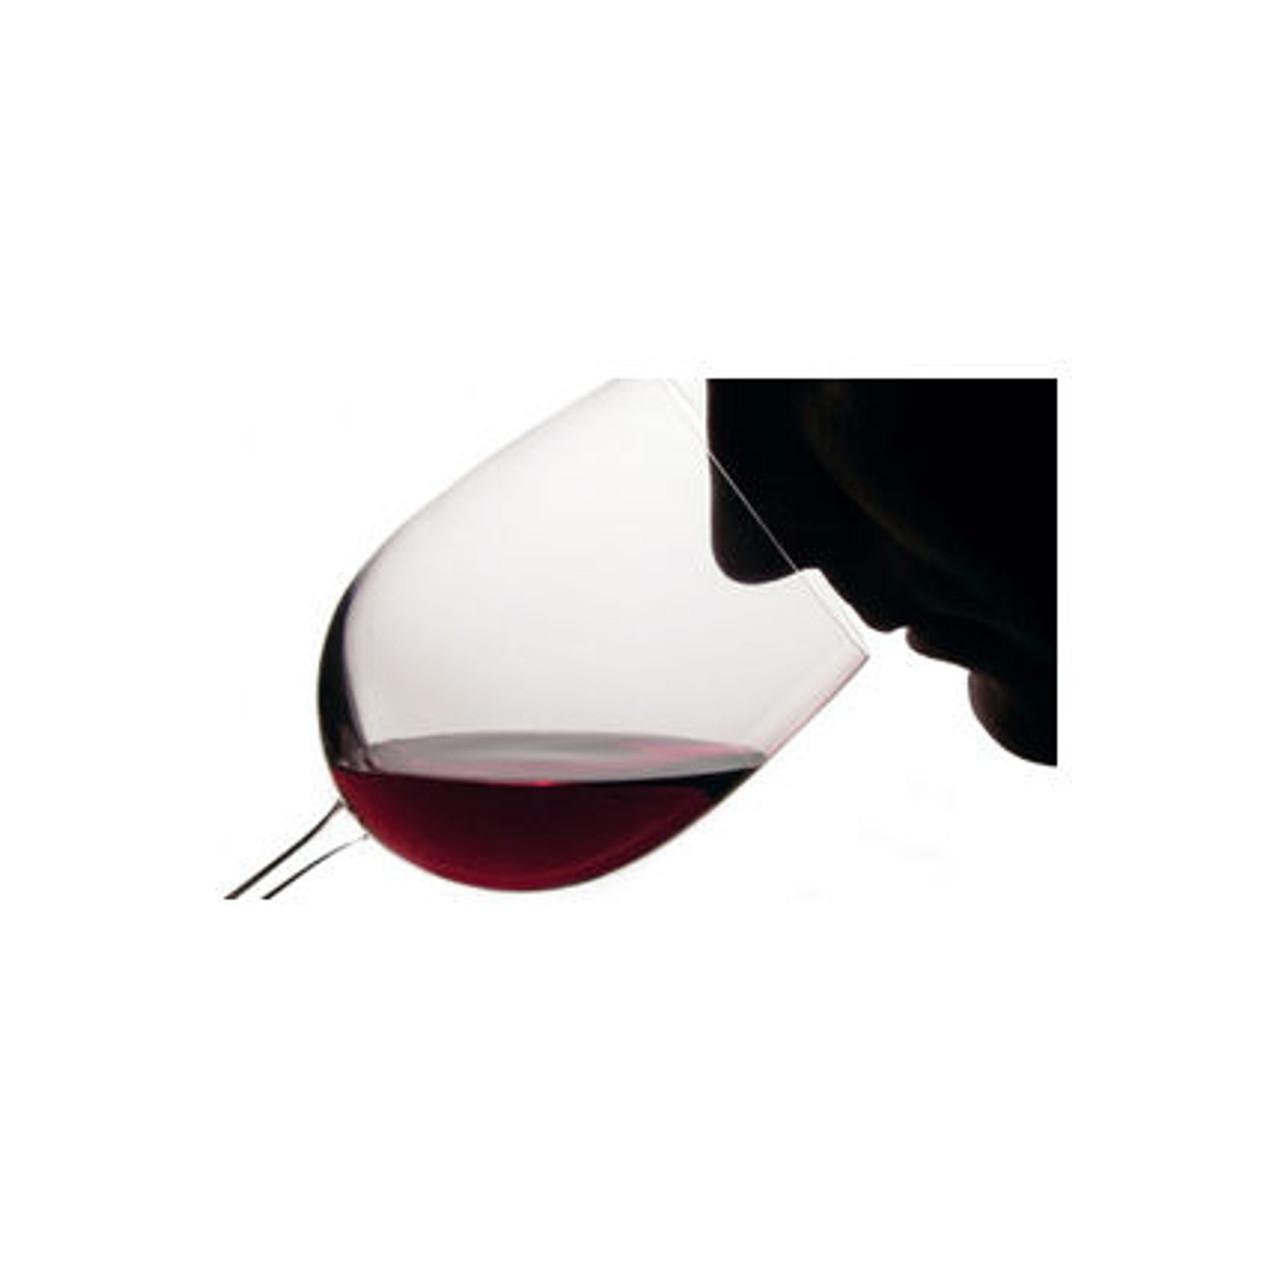 The Connoisseur Wine Club